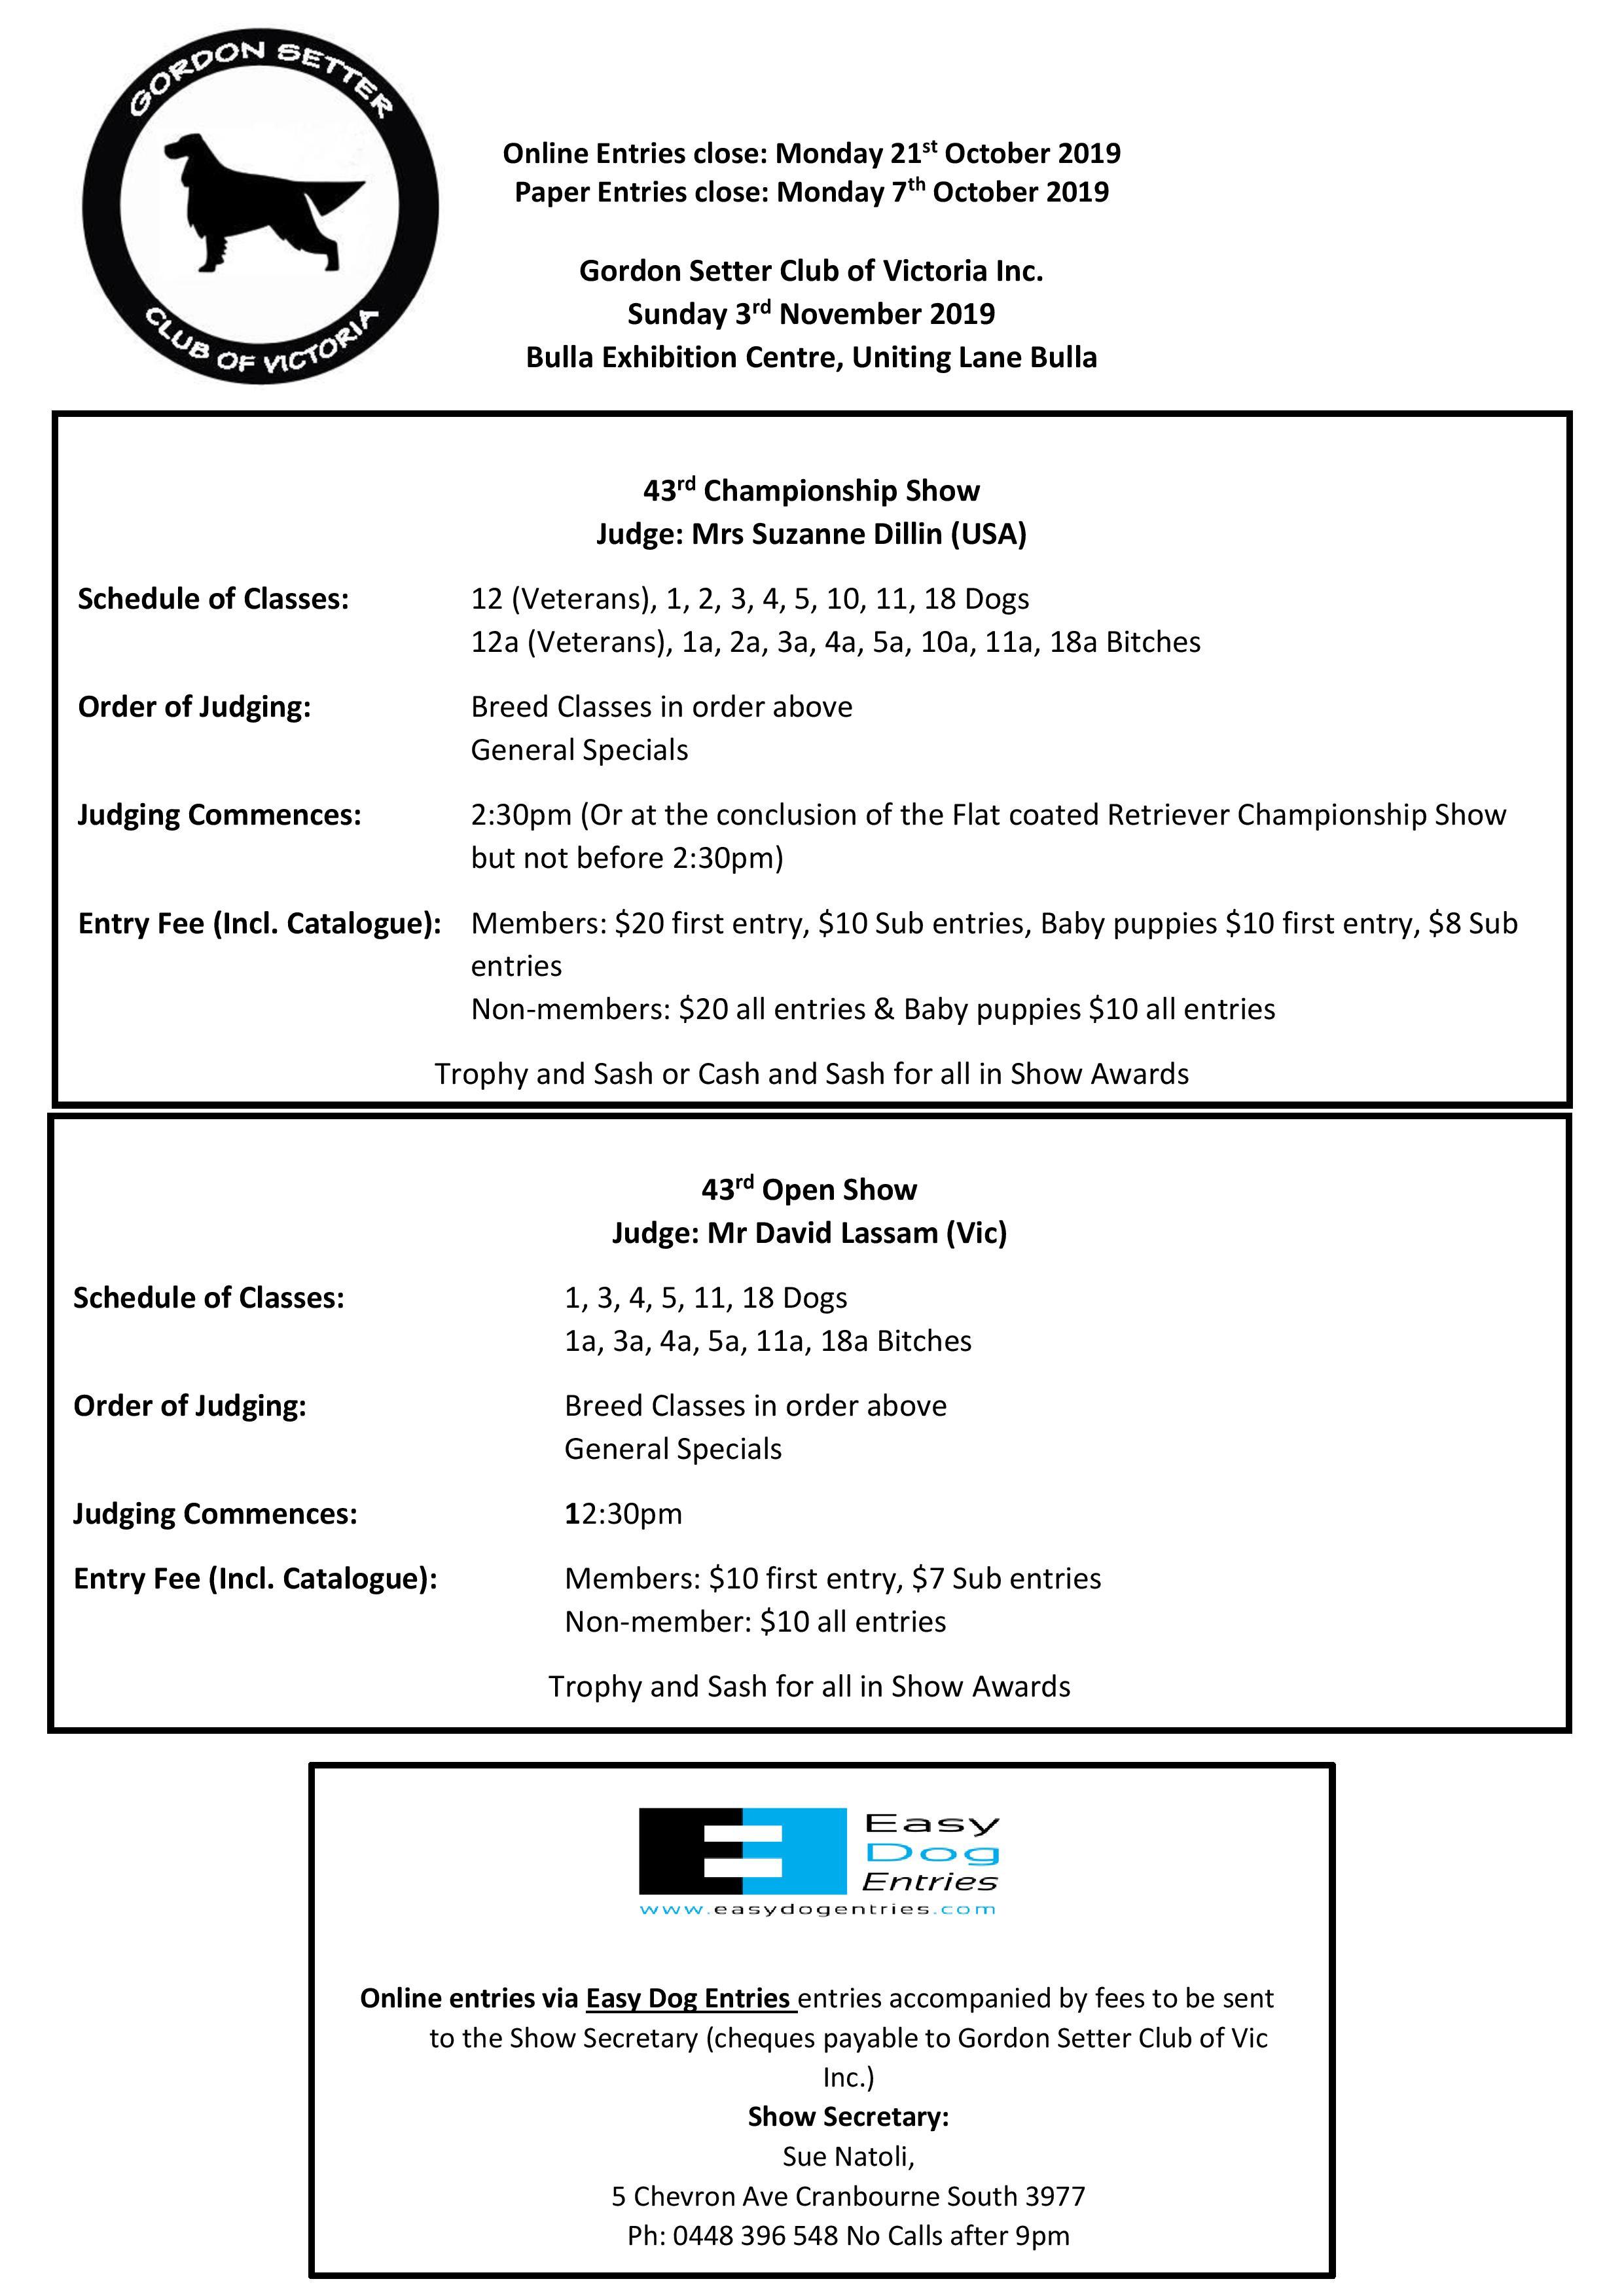 GSCV 2019 Schedule-page-001